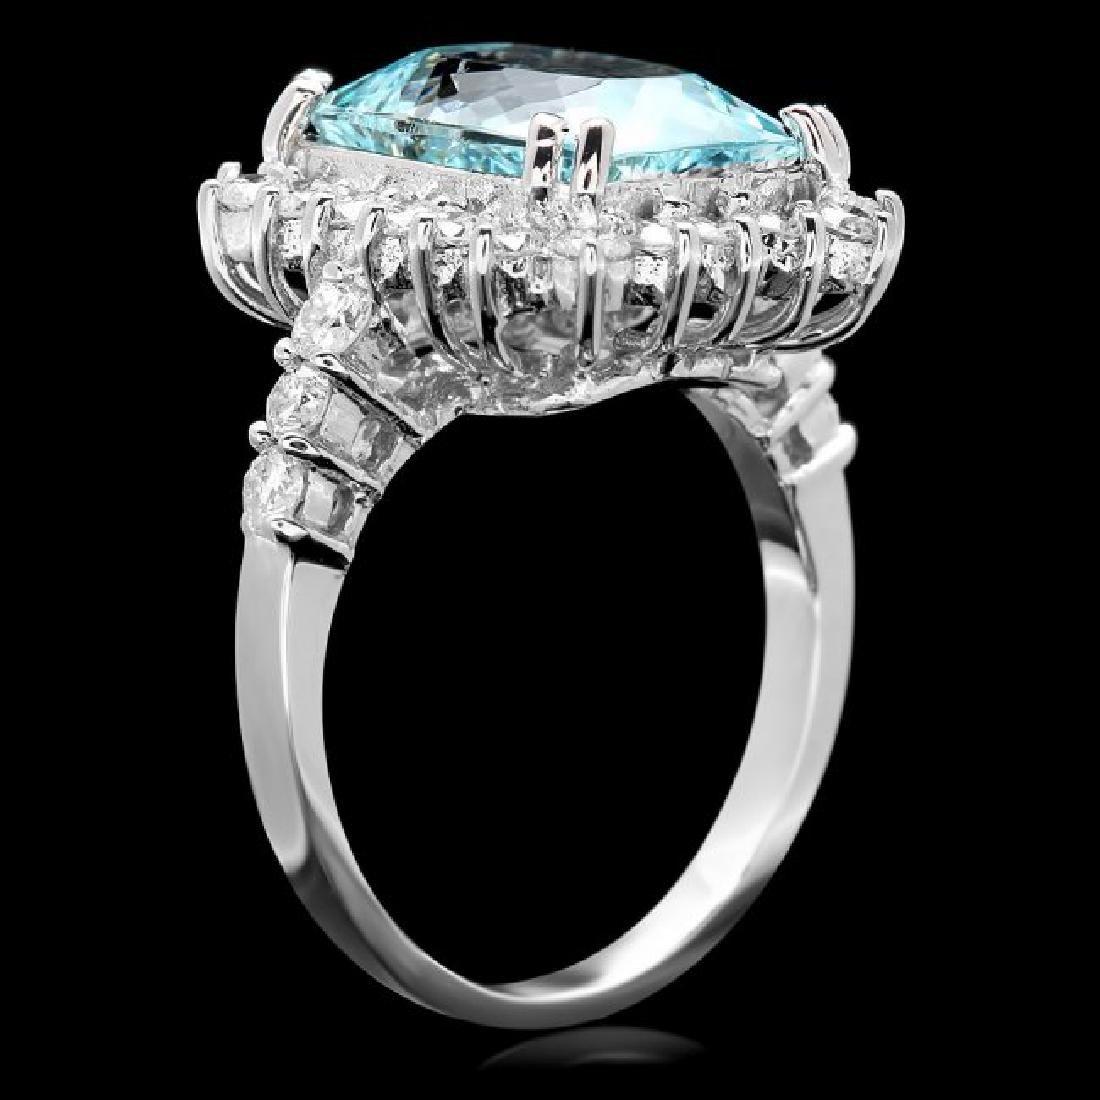 14k Gold 5.00ct Aquamarine 1.20ct Diamond Ring - 3